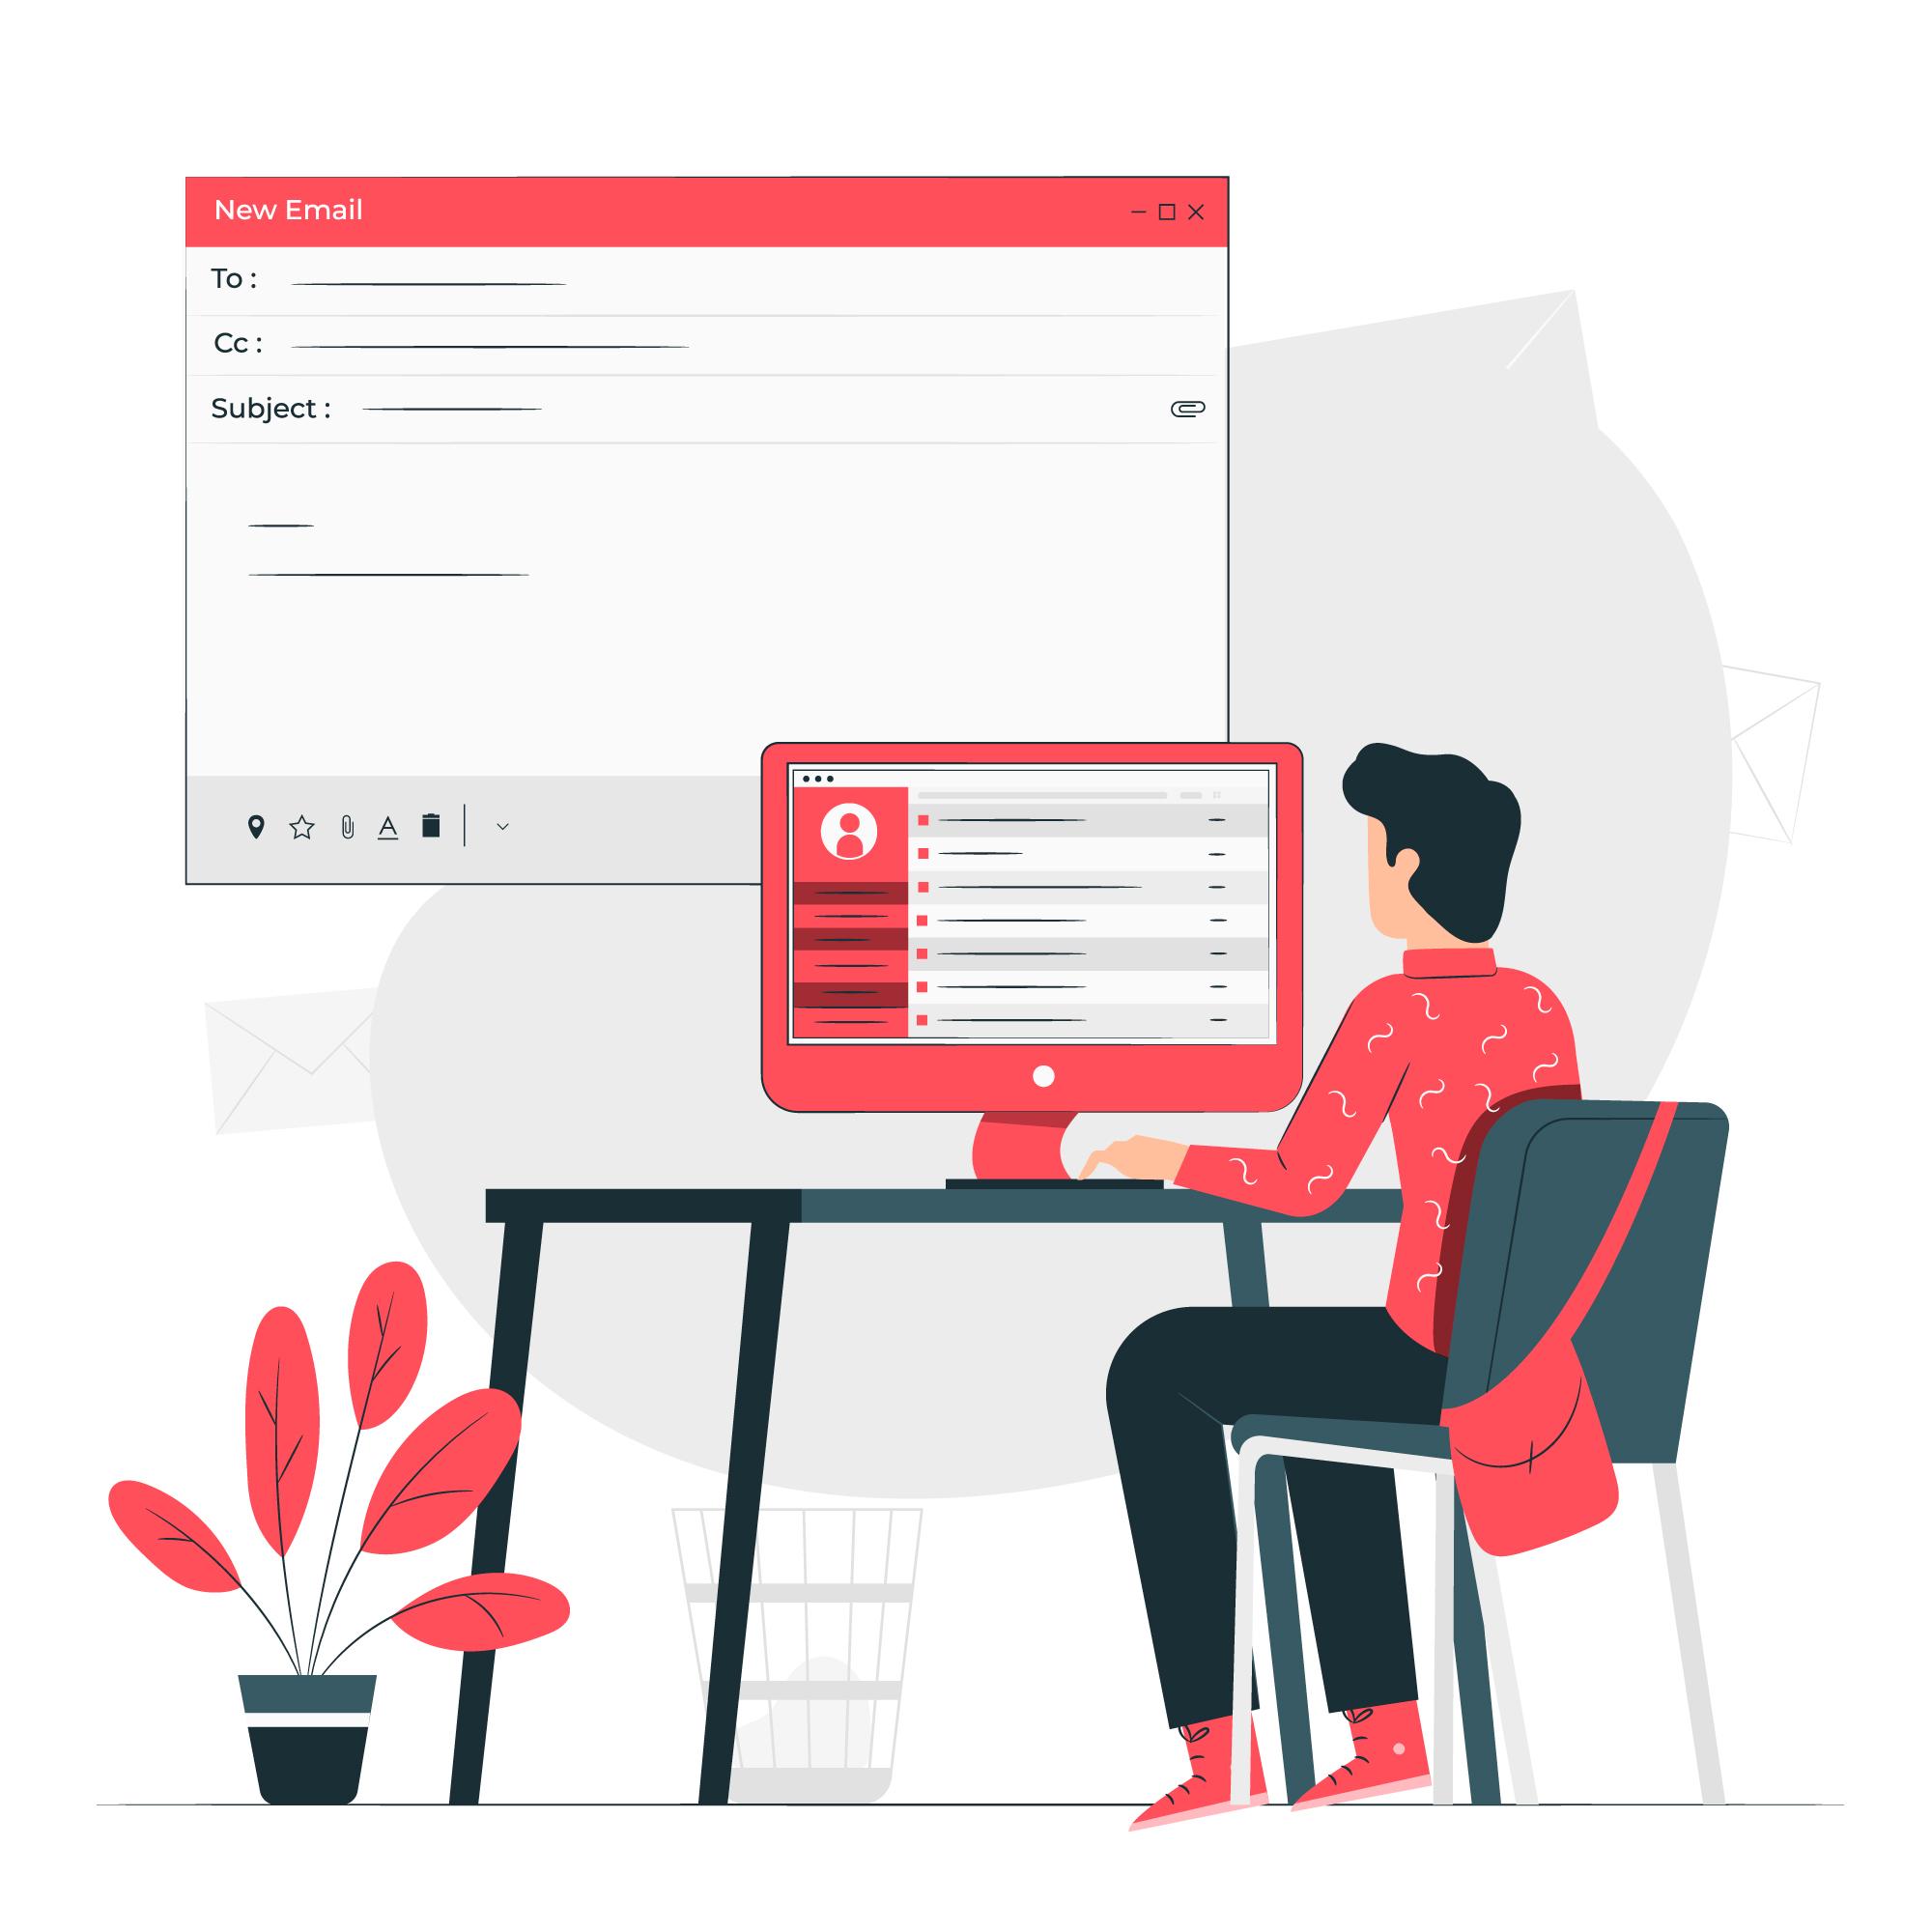 Beneficios-del-email-corporativo